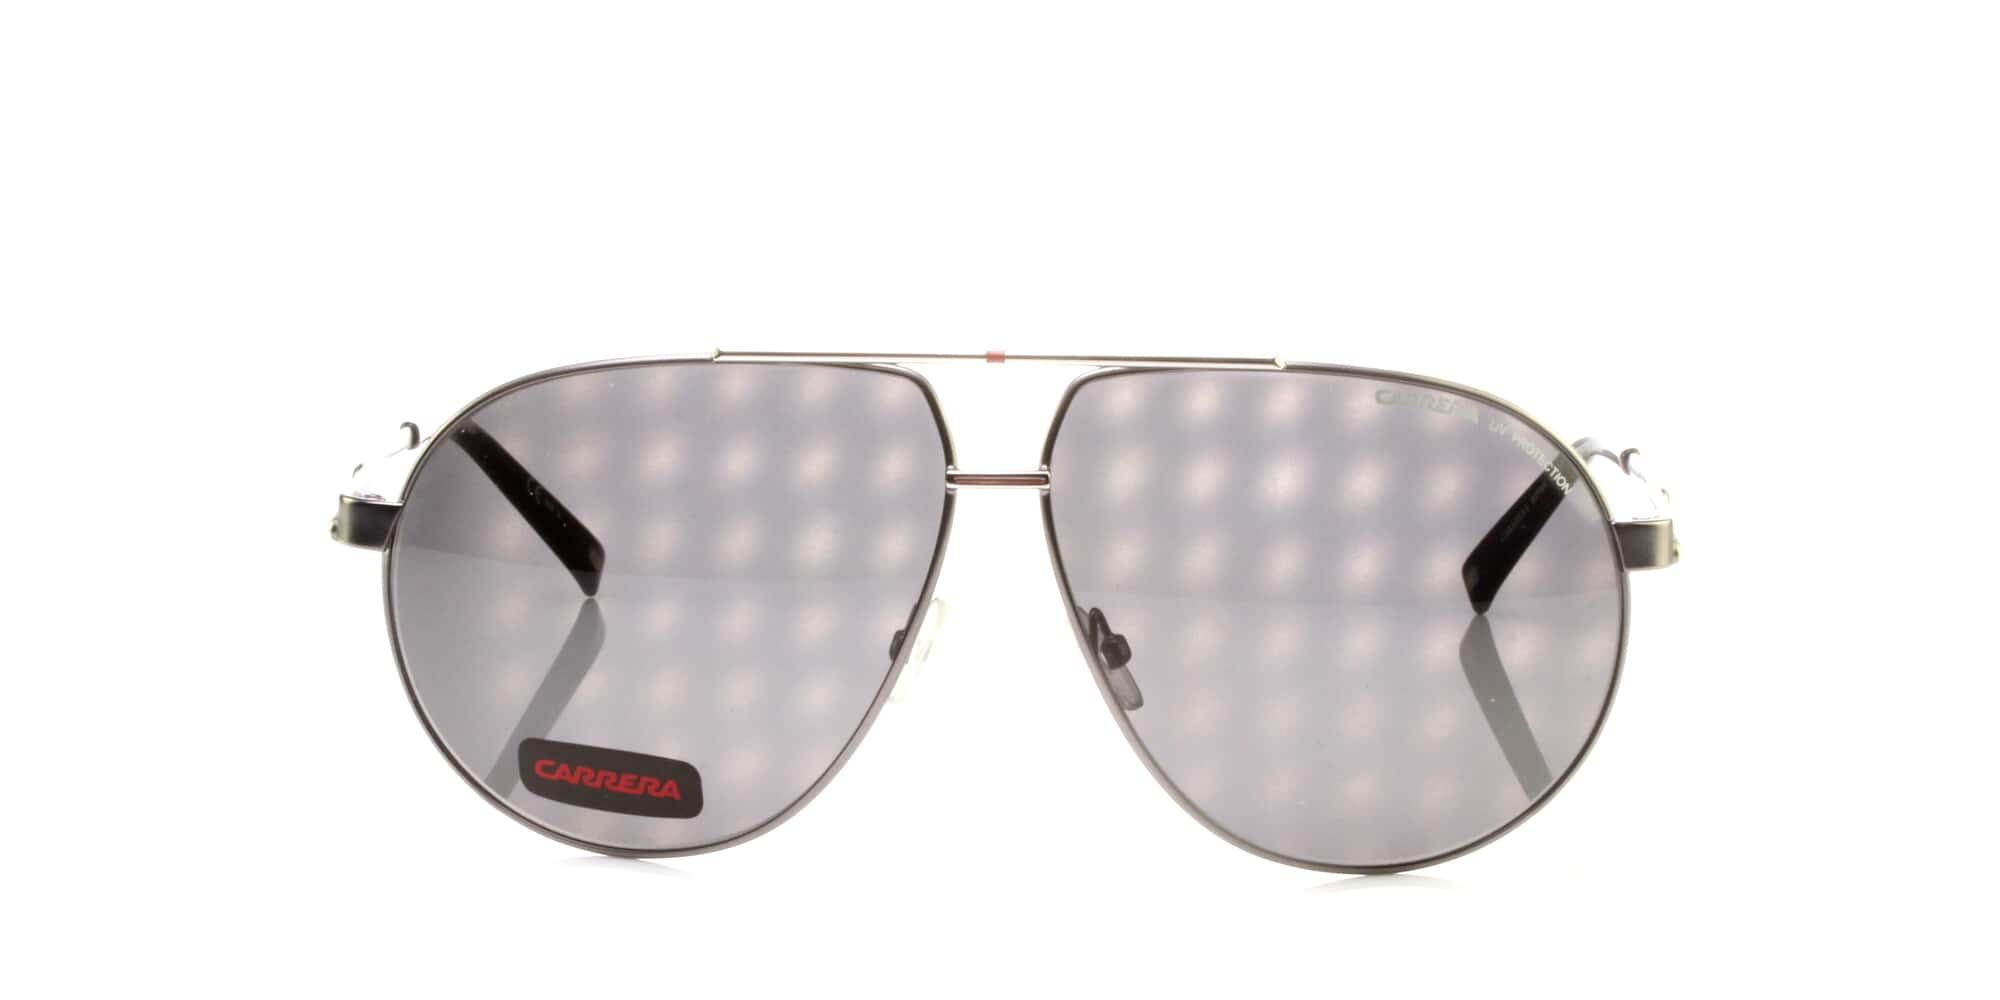 a182346f2d2 Buy Carrera 6 82PNR (64-10-135) Sunglasses (SALE)